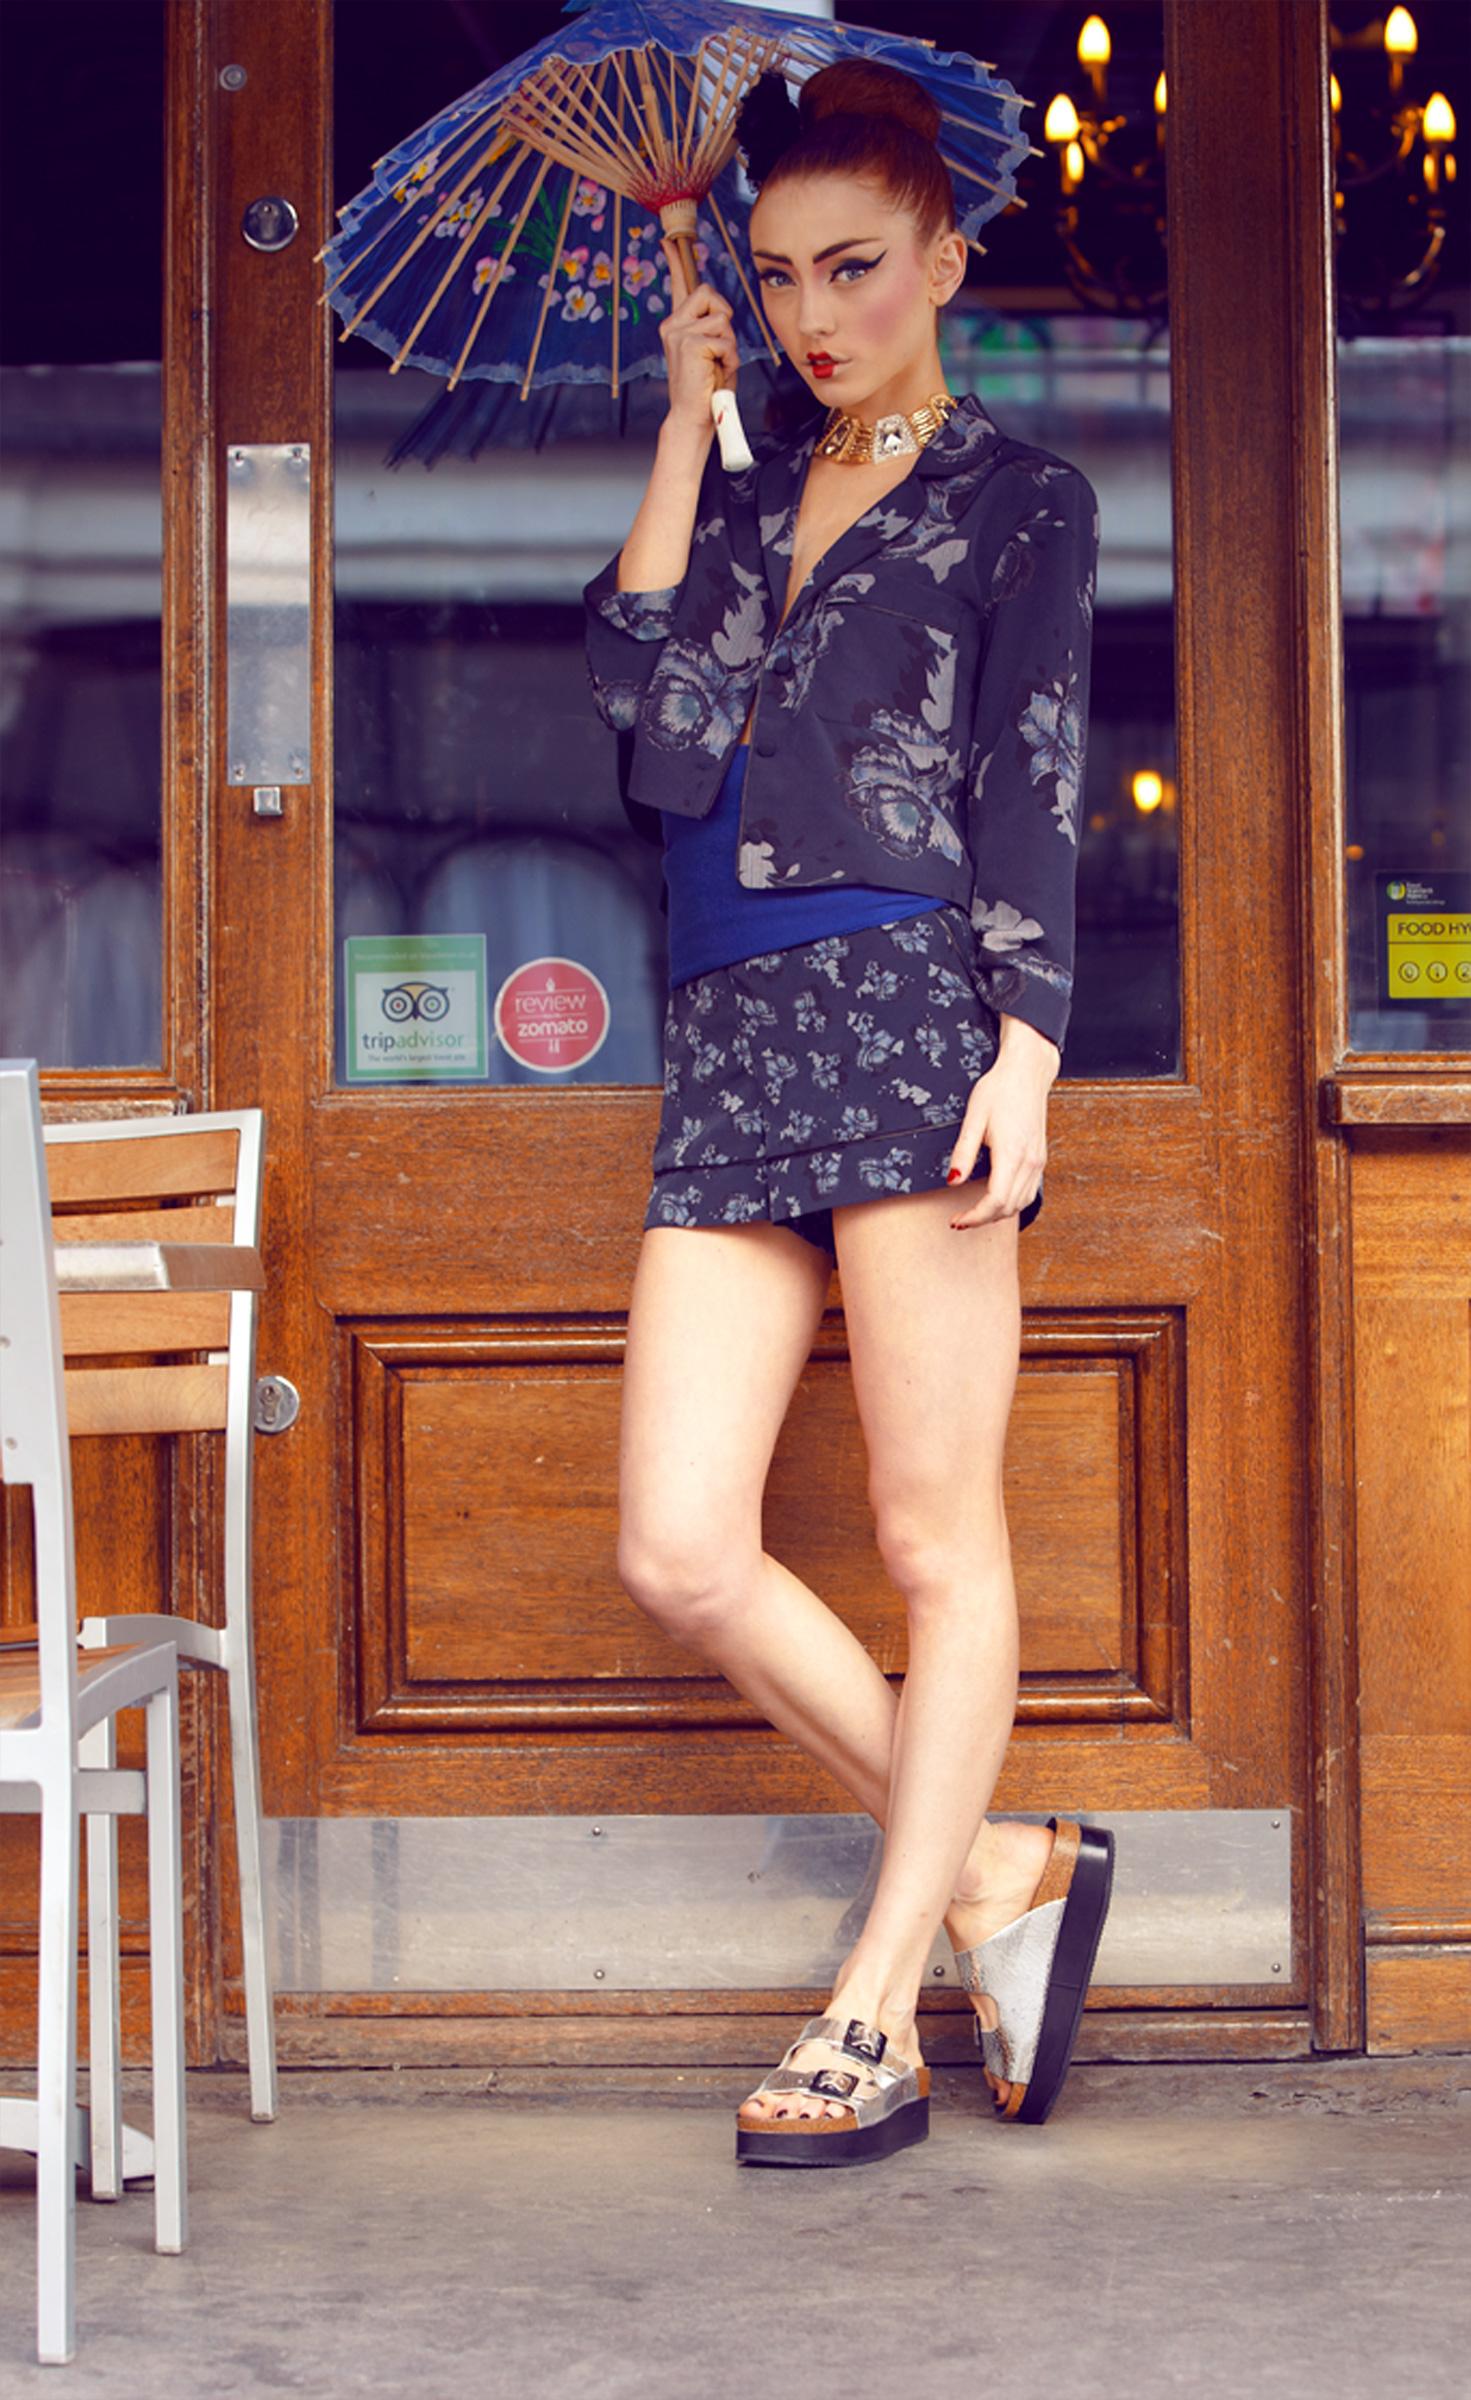 JC-GEISHA---RIO-DEBOLLA-Models1UK-Melissa-Uren-Photography-FEB-2014-LOOK-10619-FINAL-WEB-V2.jpg